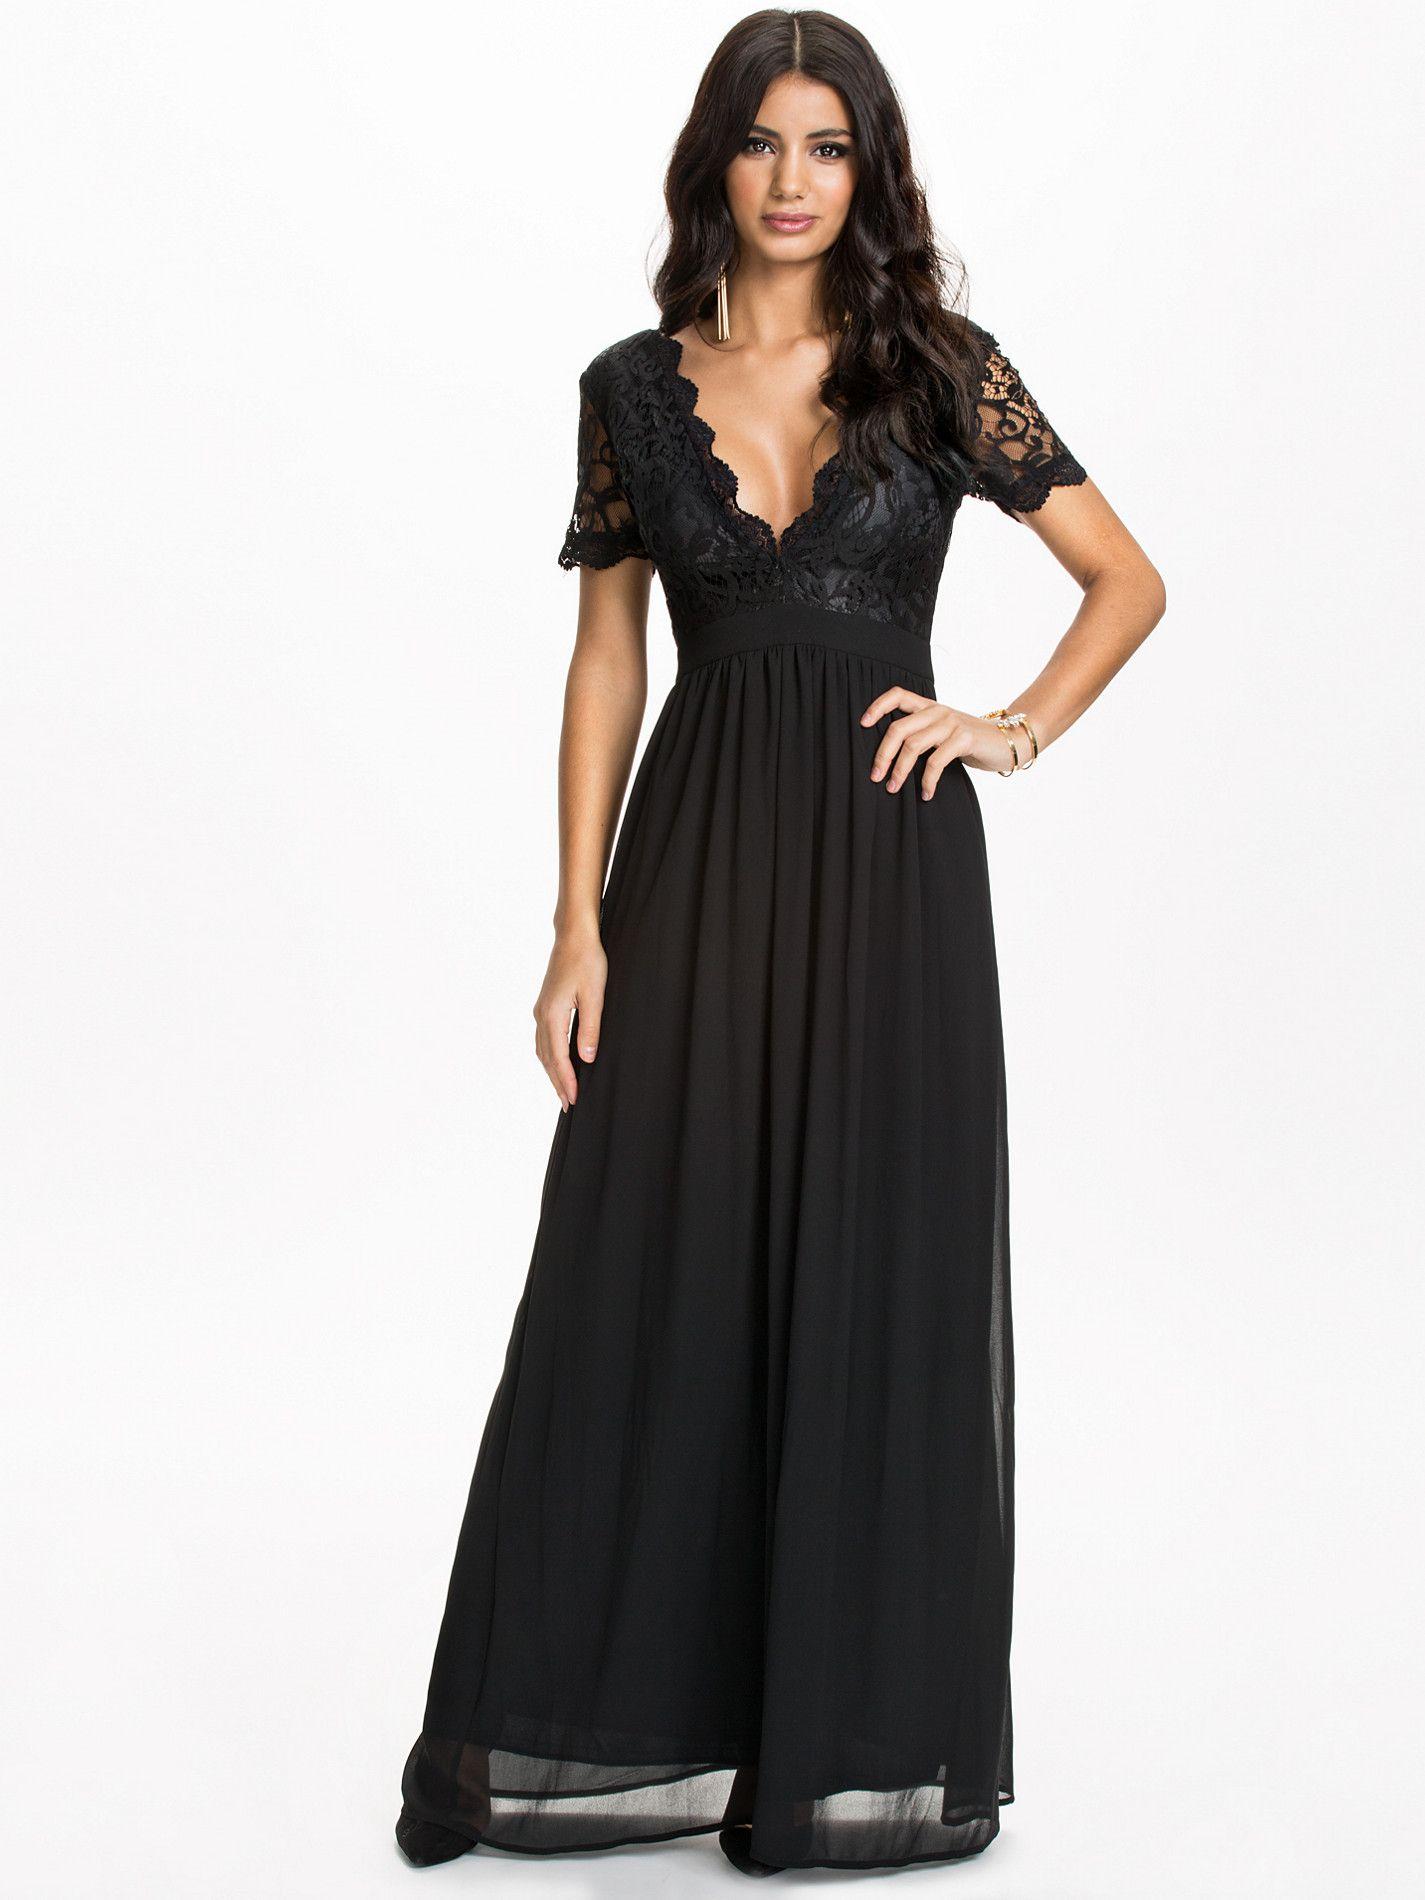 b39f4e86 Scalloped Lace Maxi Dress - Club L - Svart - Festkjoler - Klær - Kvinne -